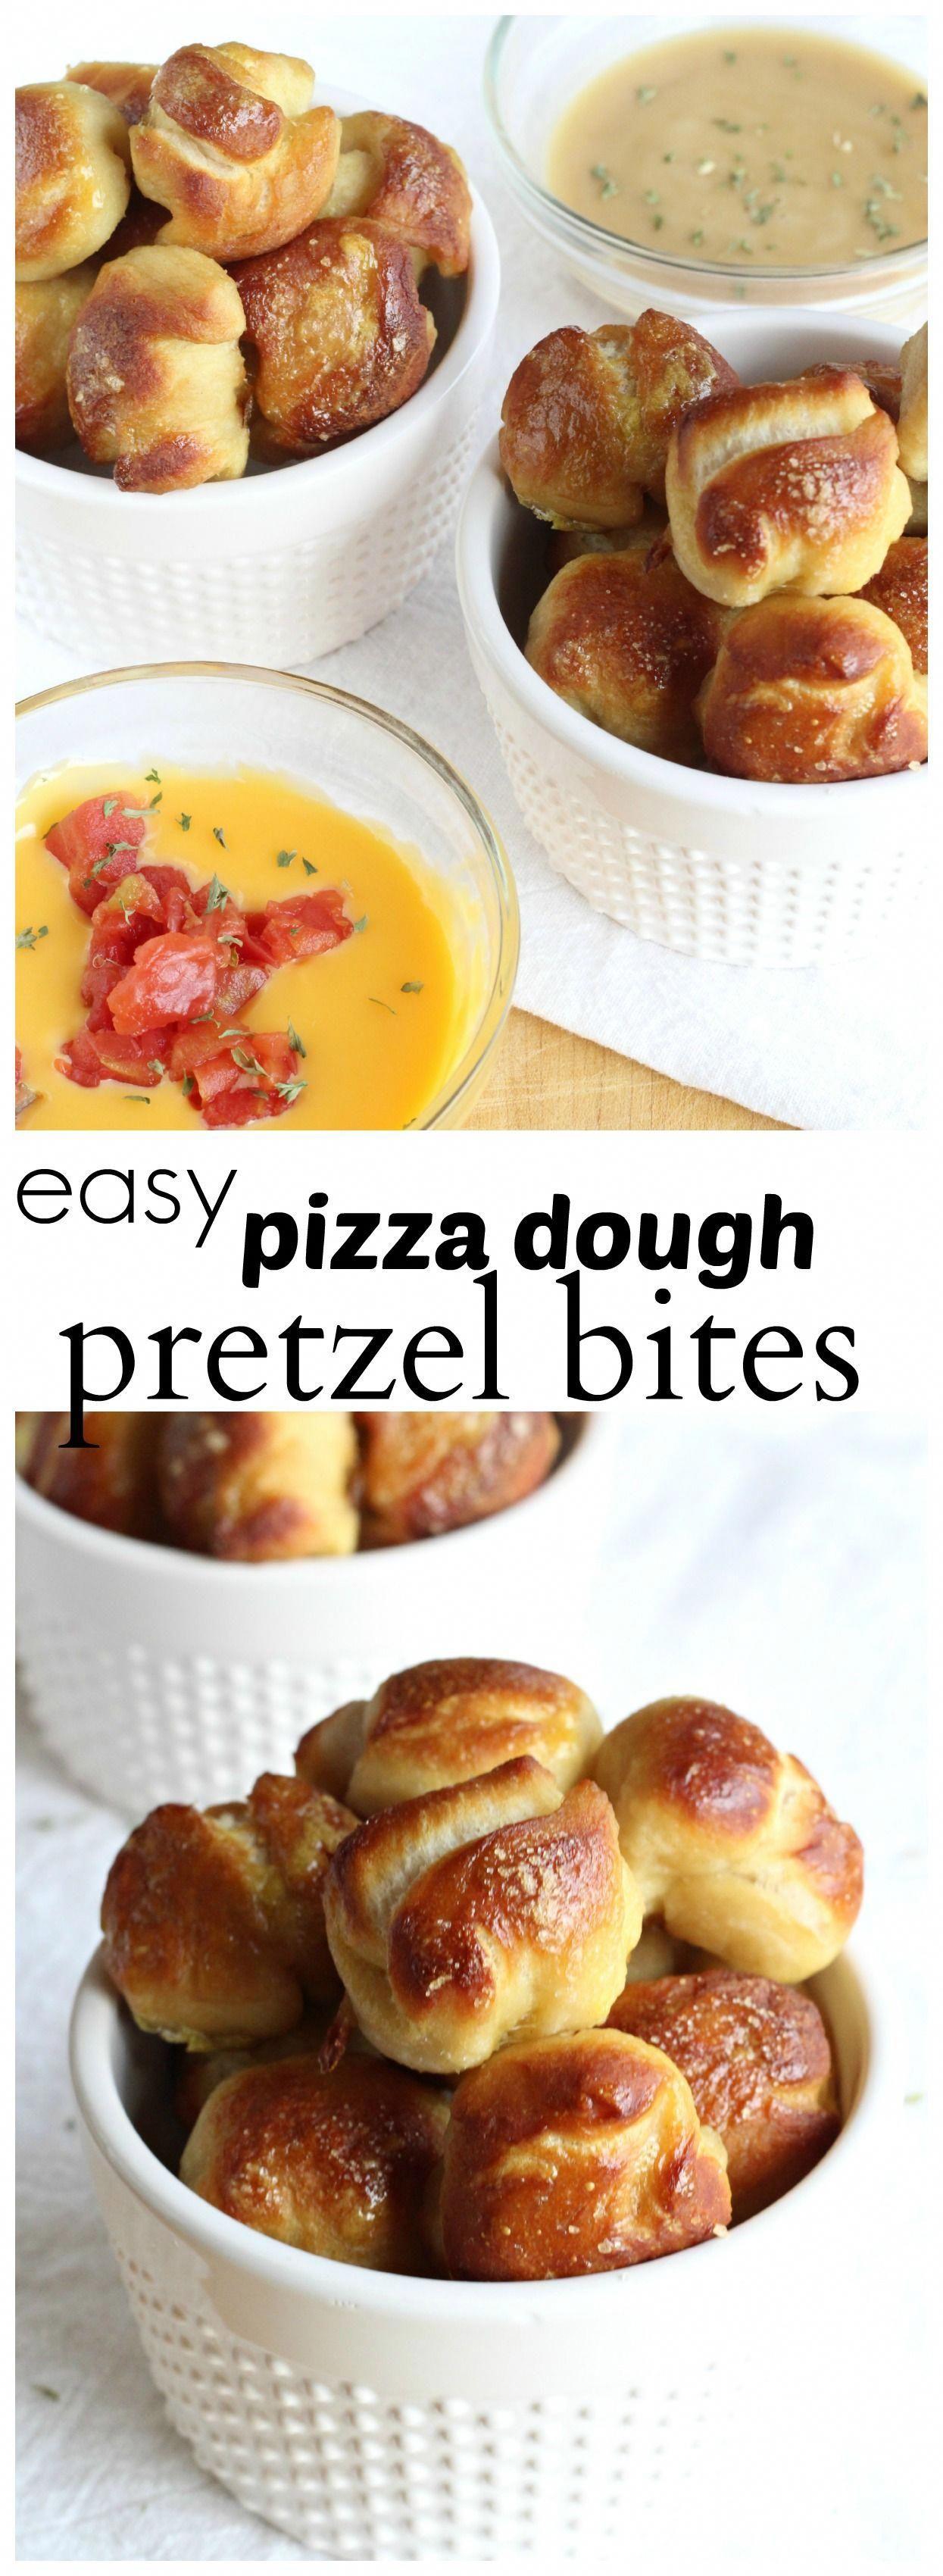 78 delicious Pretzel bites recipes, Easy pizza, Easy